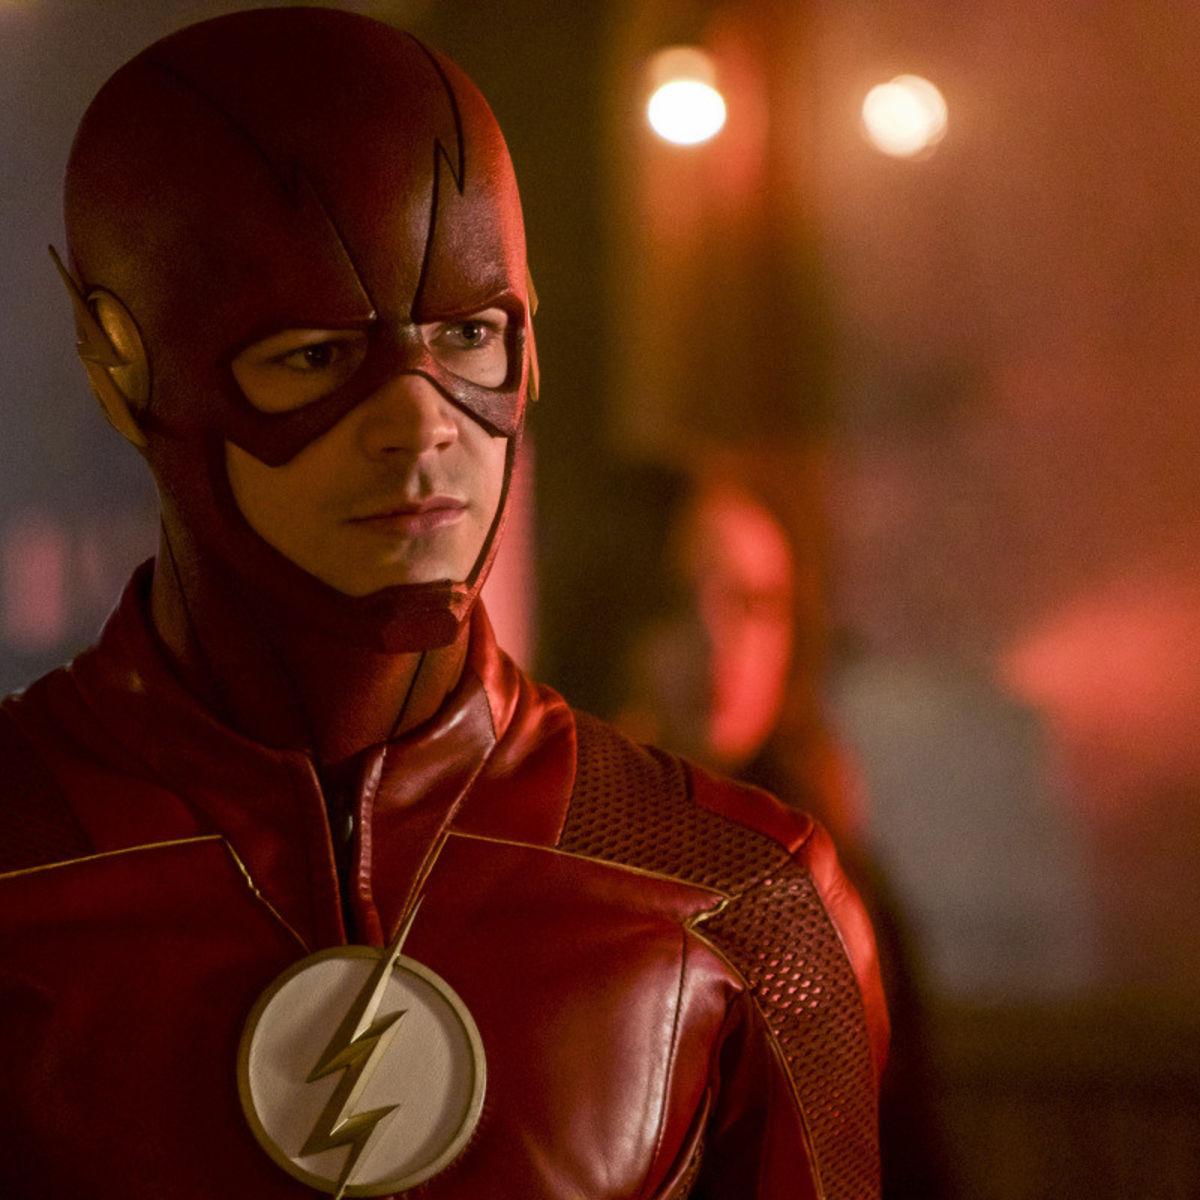 The Flash Grant Gustin